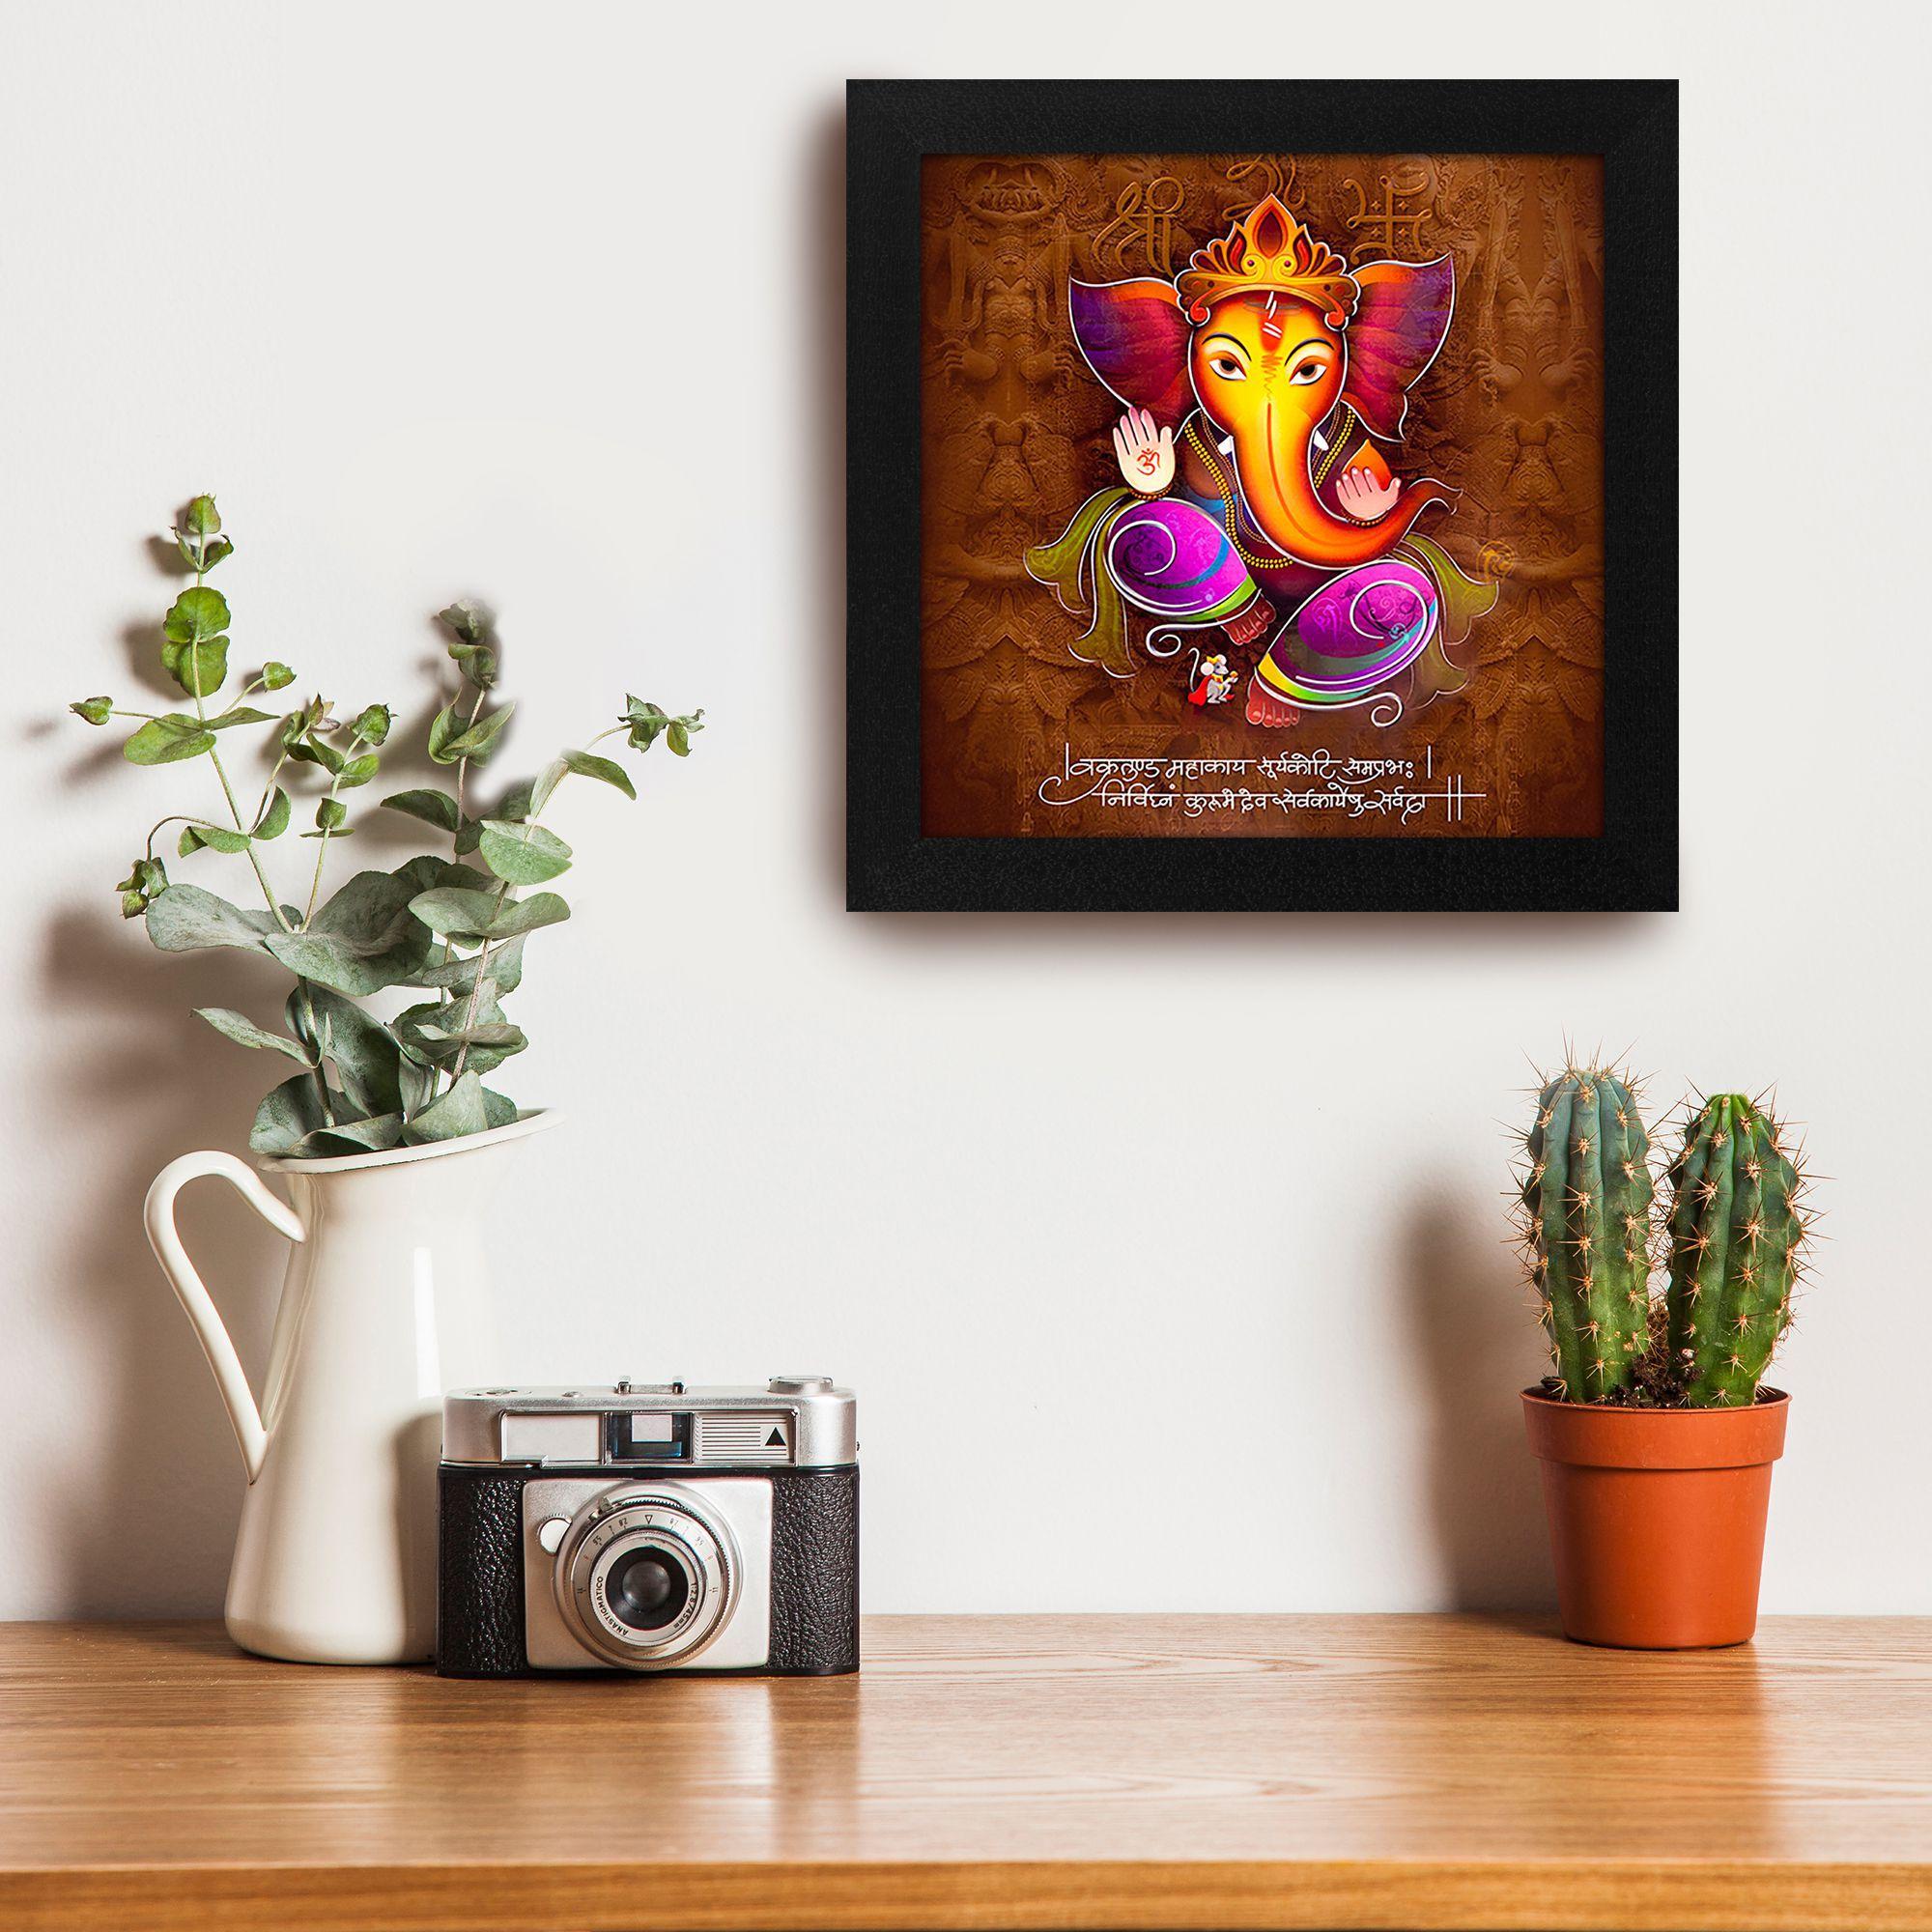 StoryHome Ganesha Wood Art Prints With